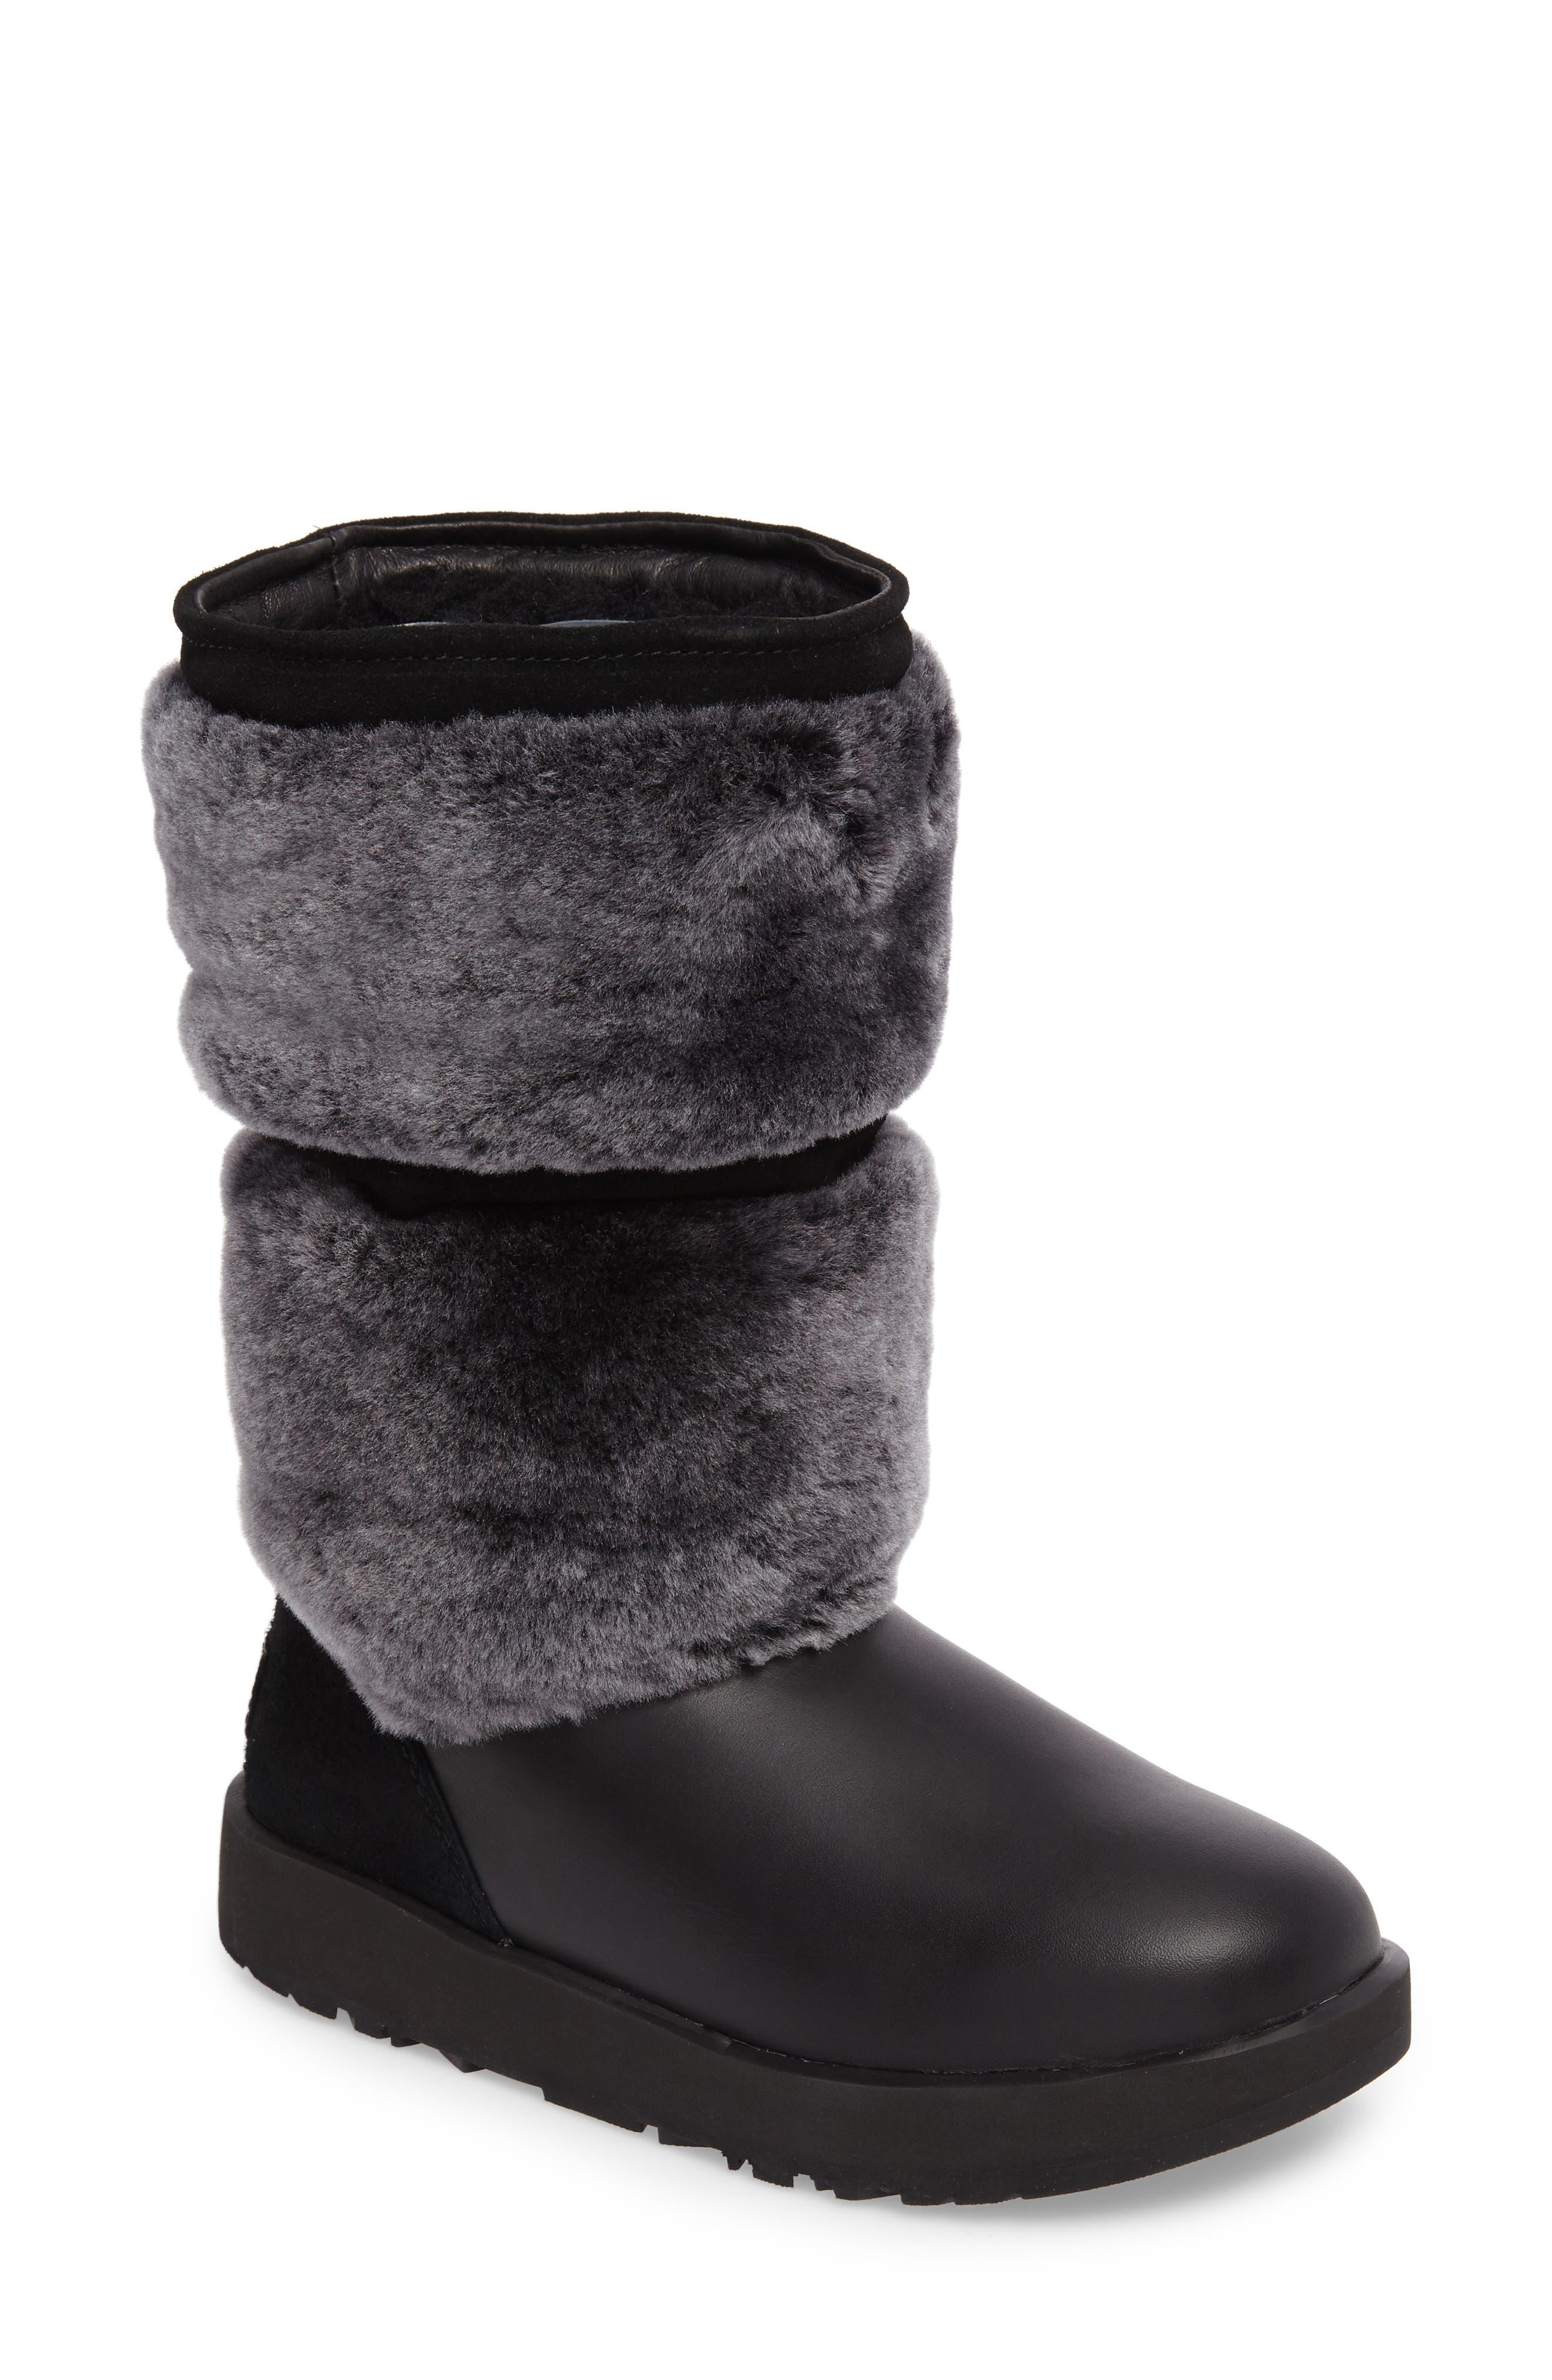 Reykir Waterproof Snow Boot,                             Main thumbnail 1, color,